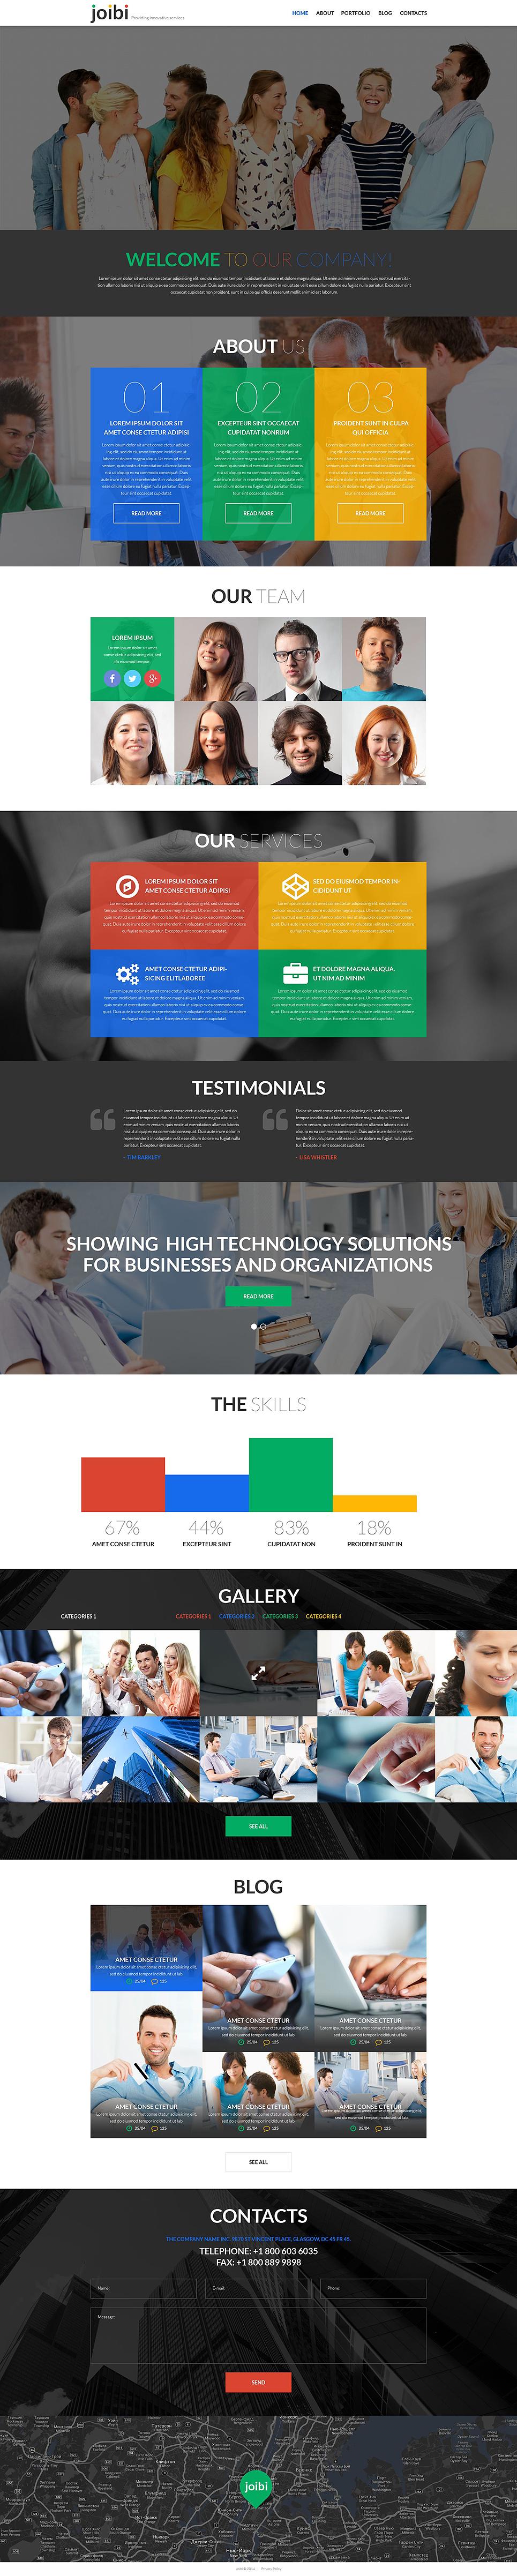 Адаптивный шаблон сайта на тему бизнес и услуги #52442